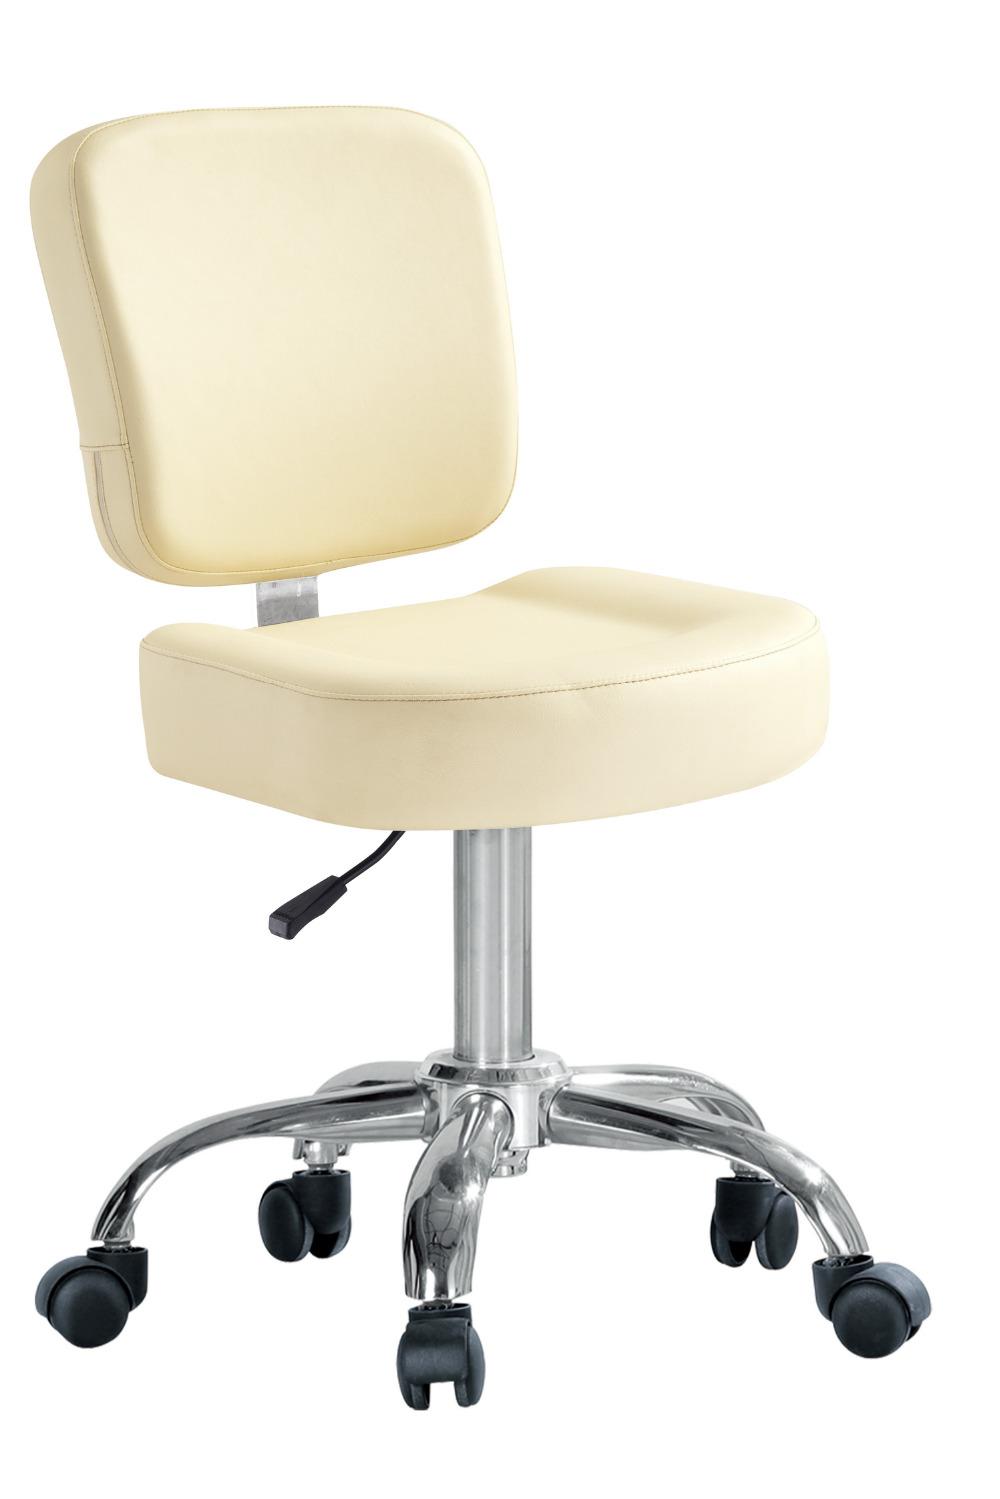 Nail salon chairs cheap cheap used spa pedicure chairs for Salon spa furniture